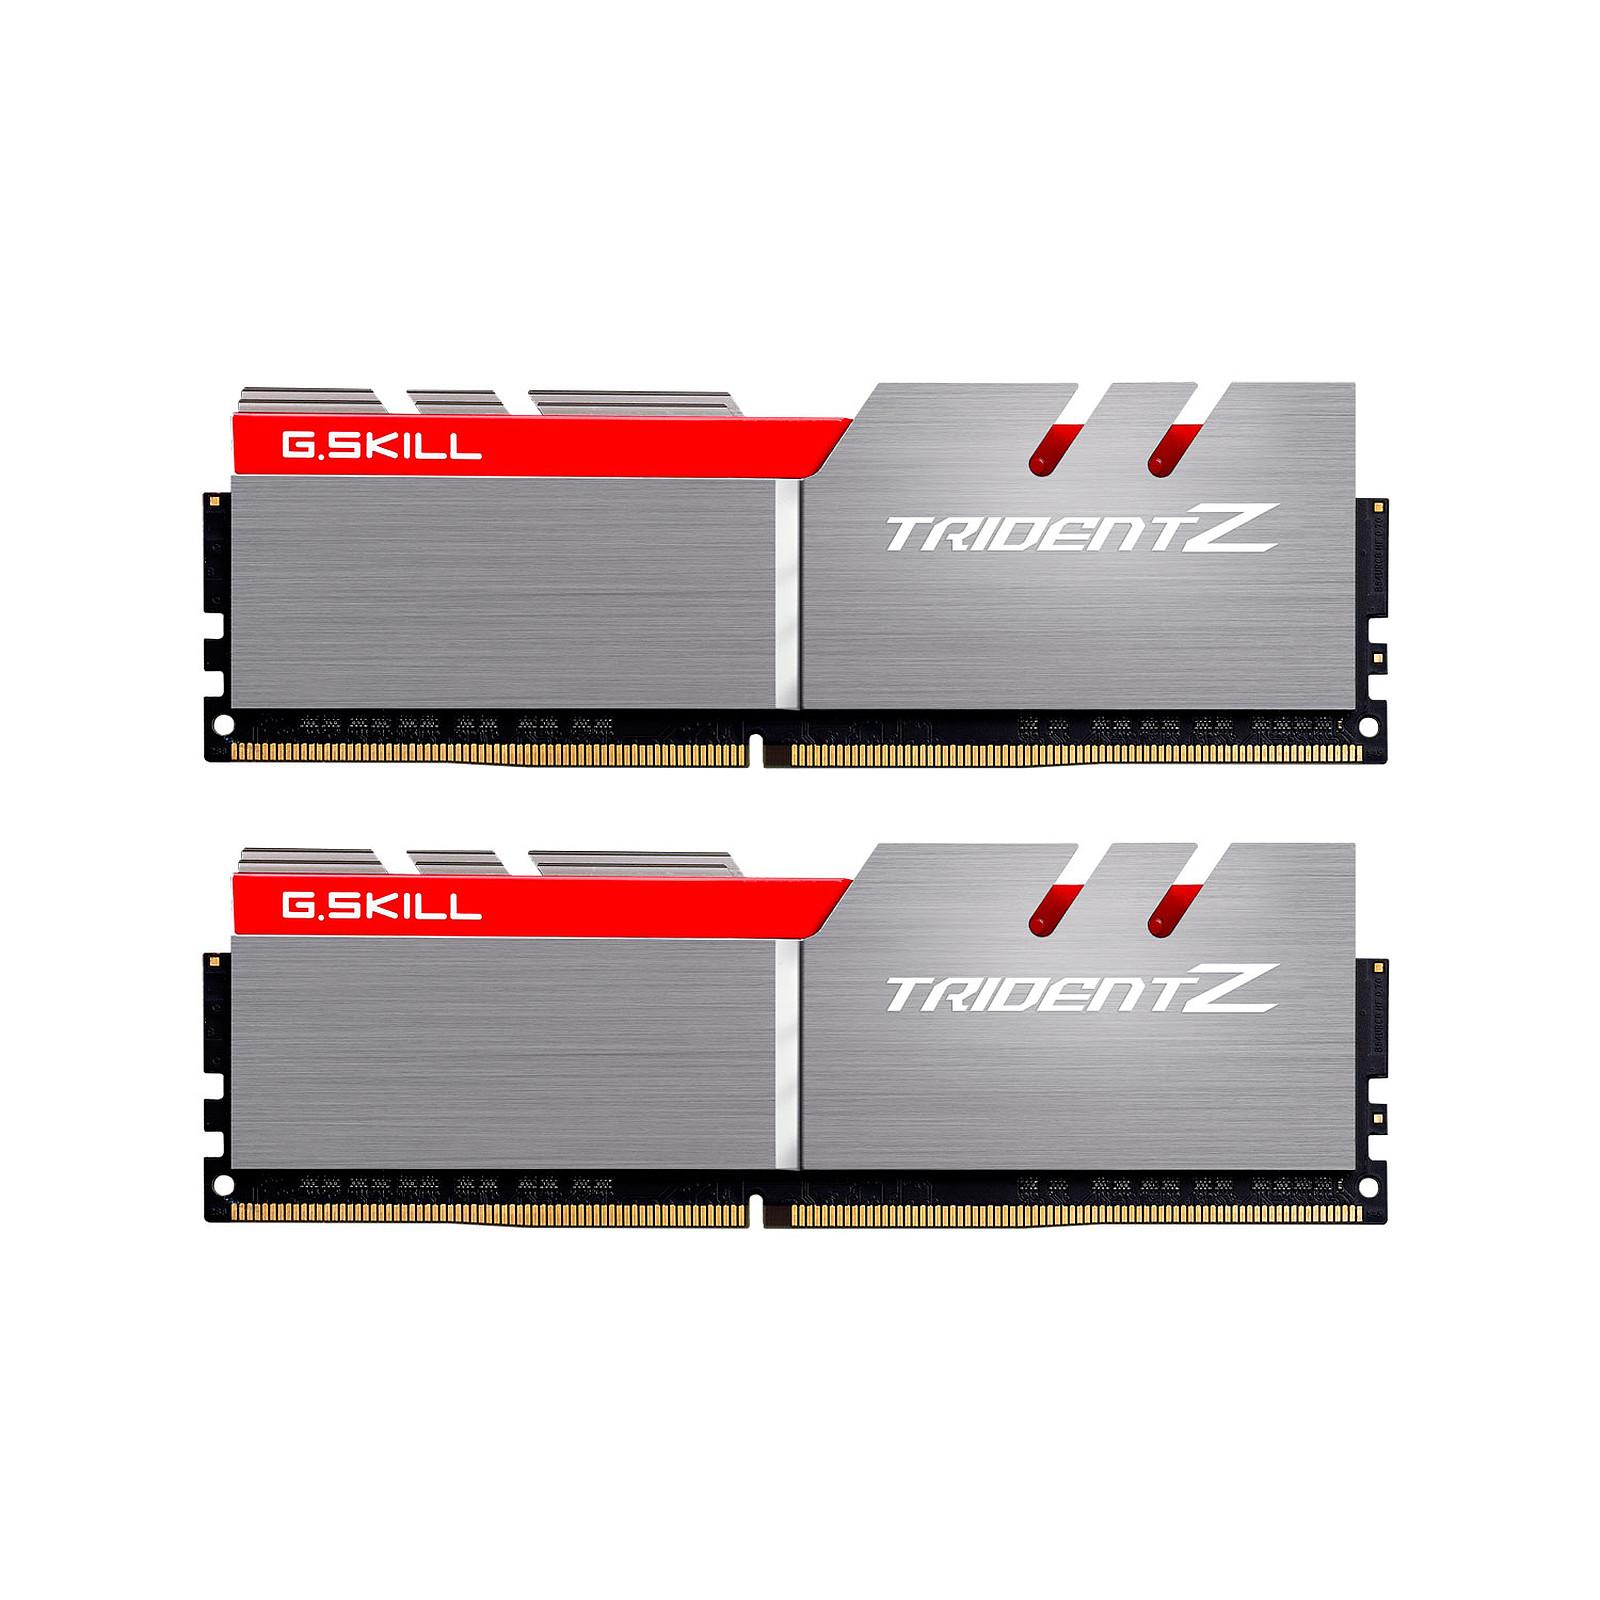 G.Skill Trident Z 16 Go (2x 8 Go) DDR4 3000 MHz CL15